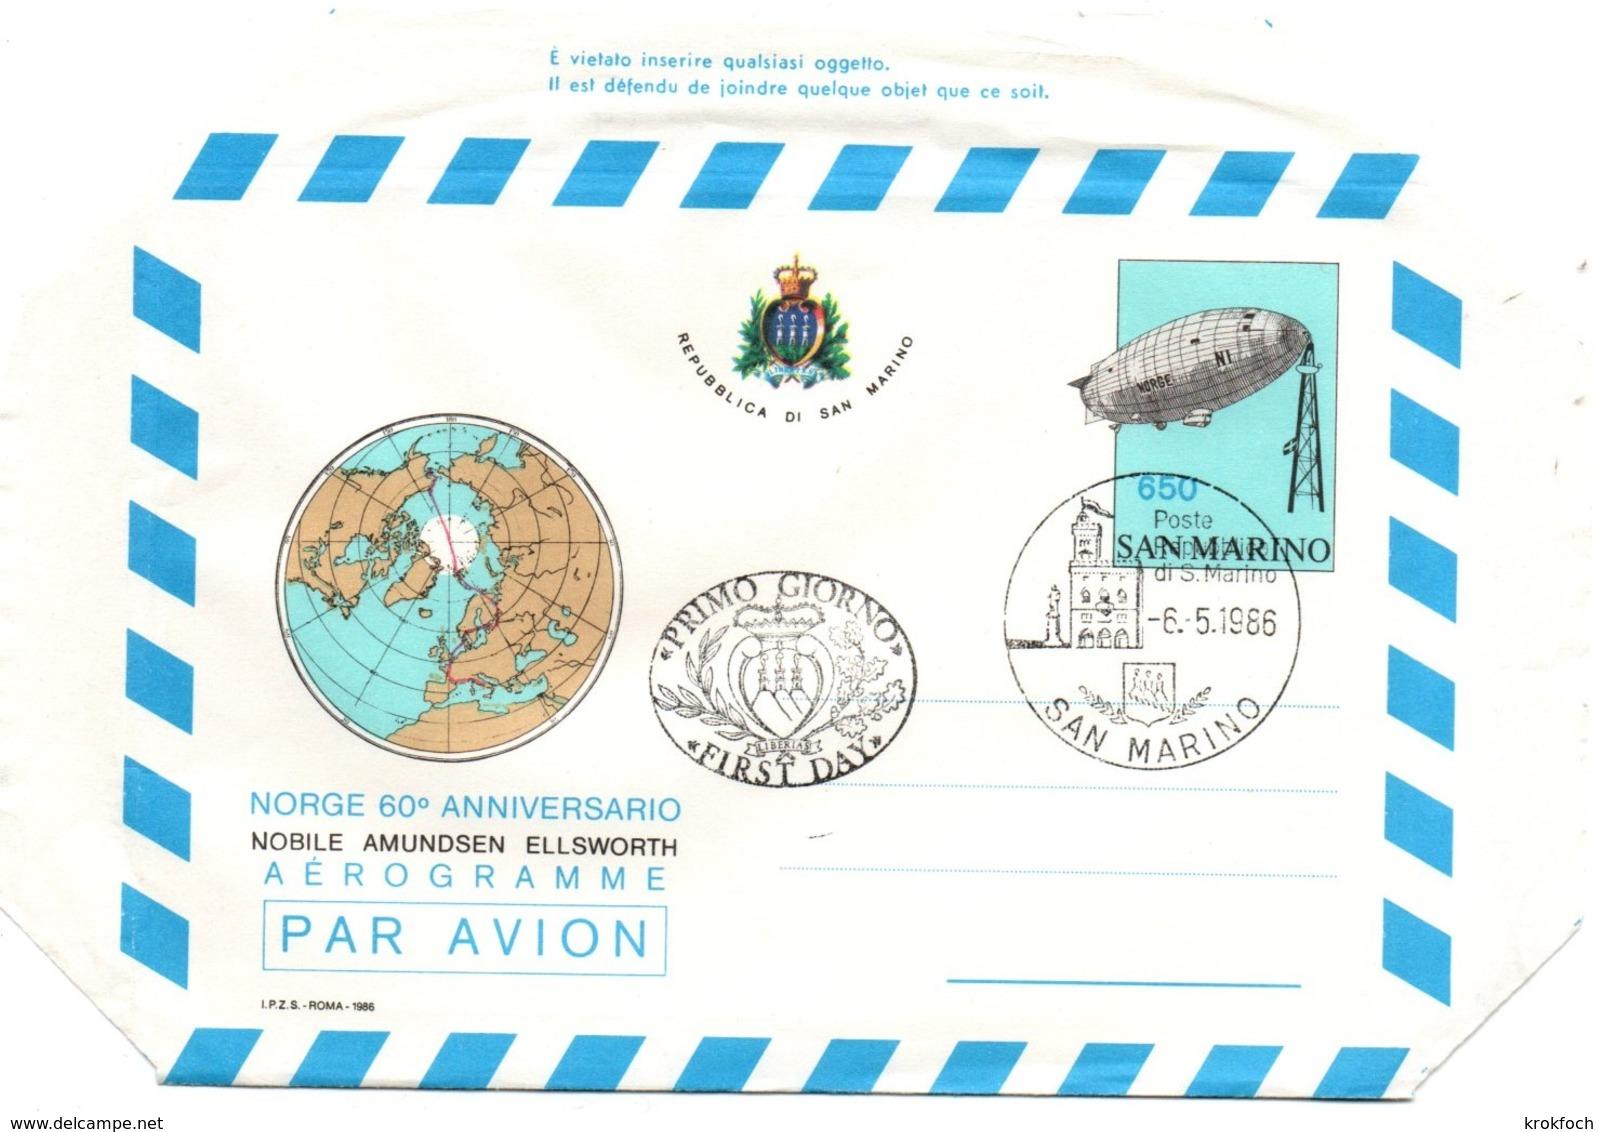 Aérogramme Dirigeable Norge Amundsen 1986 - FDC - Zeppelin Ballon - Pole Nord Arctique - Postal Stationery